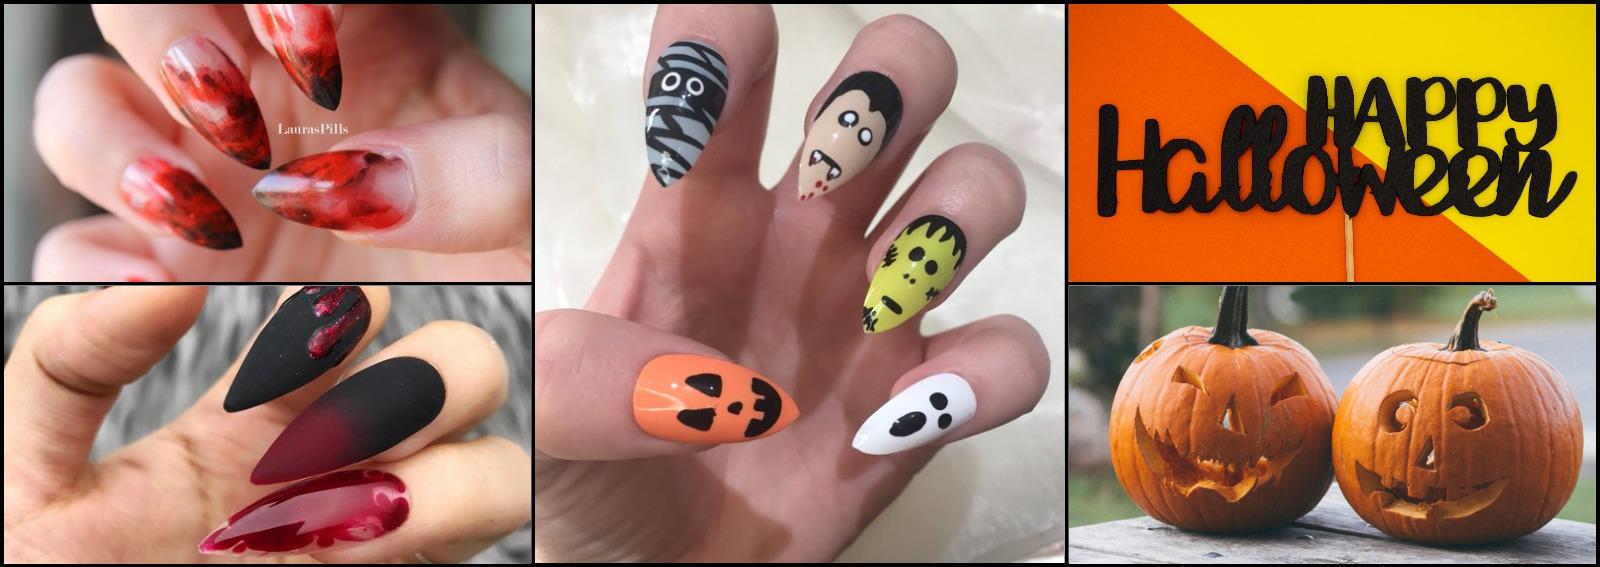 unghie halloween nail art idee 2018 manicure cover dekstop